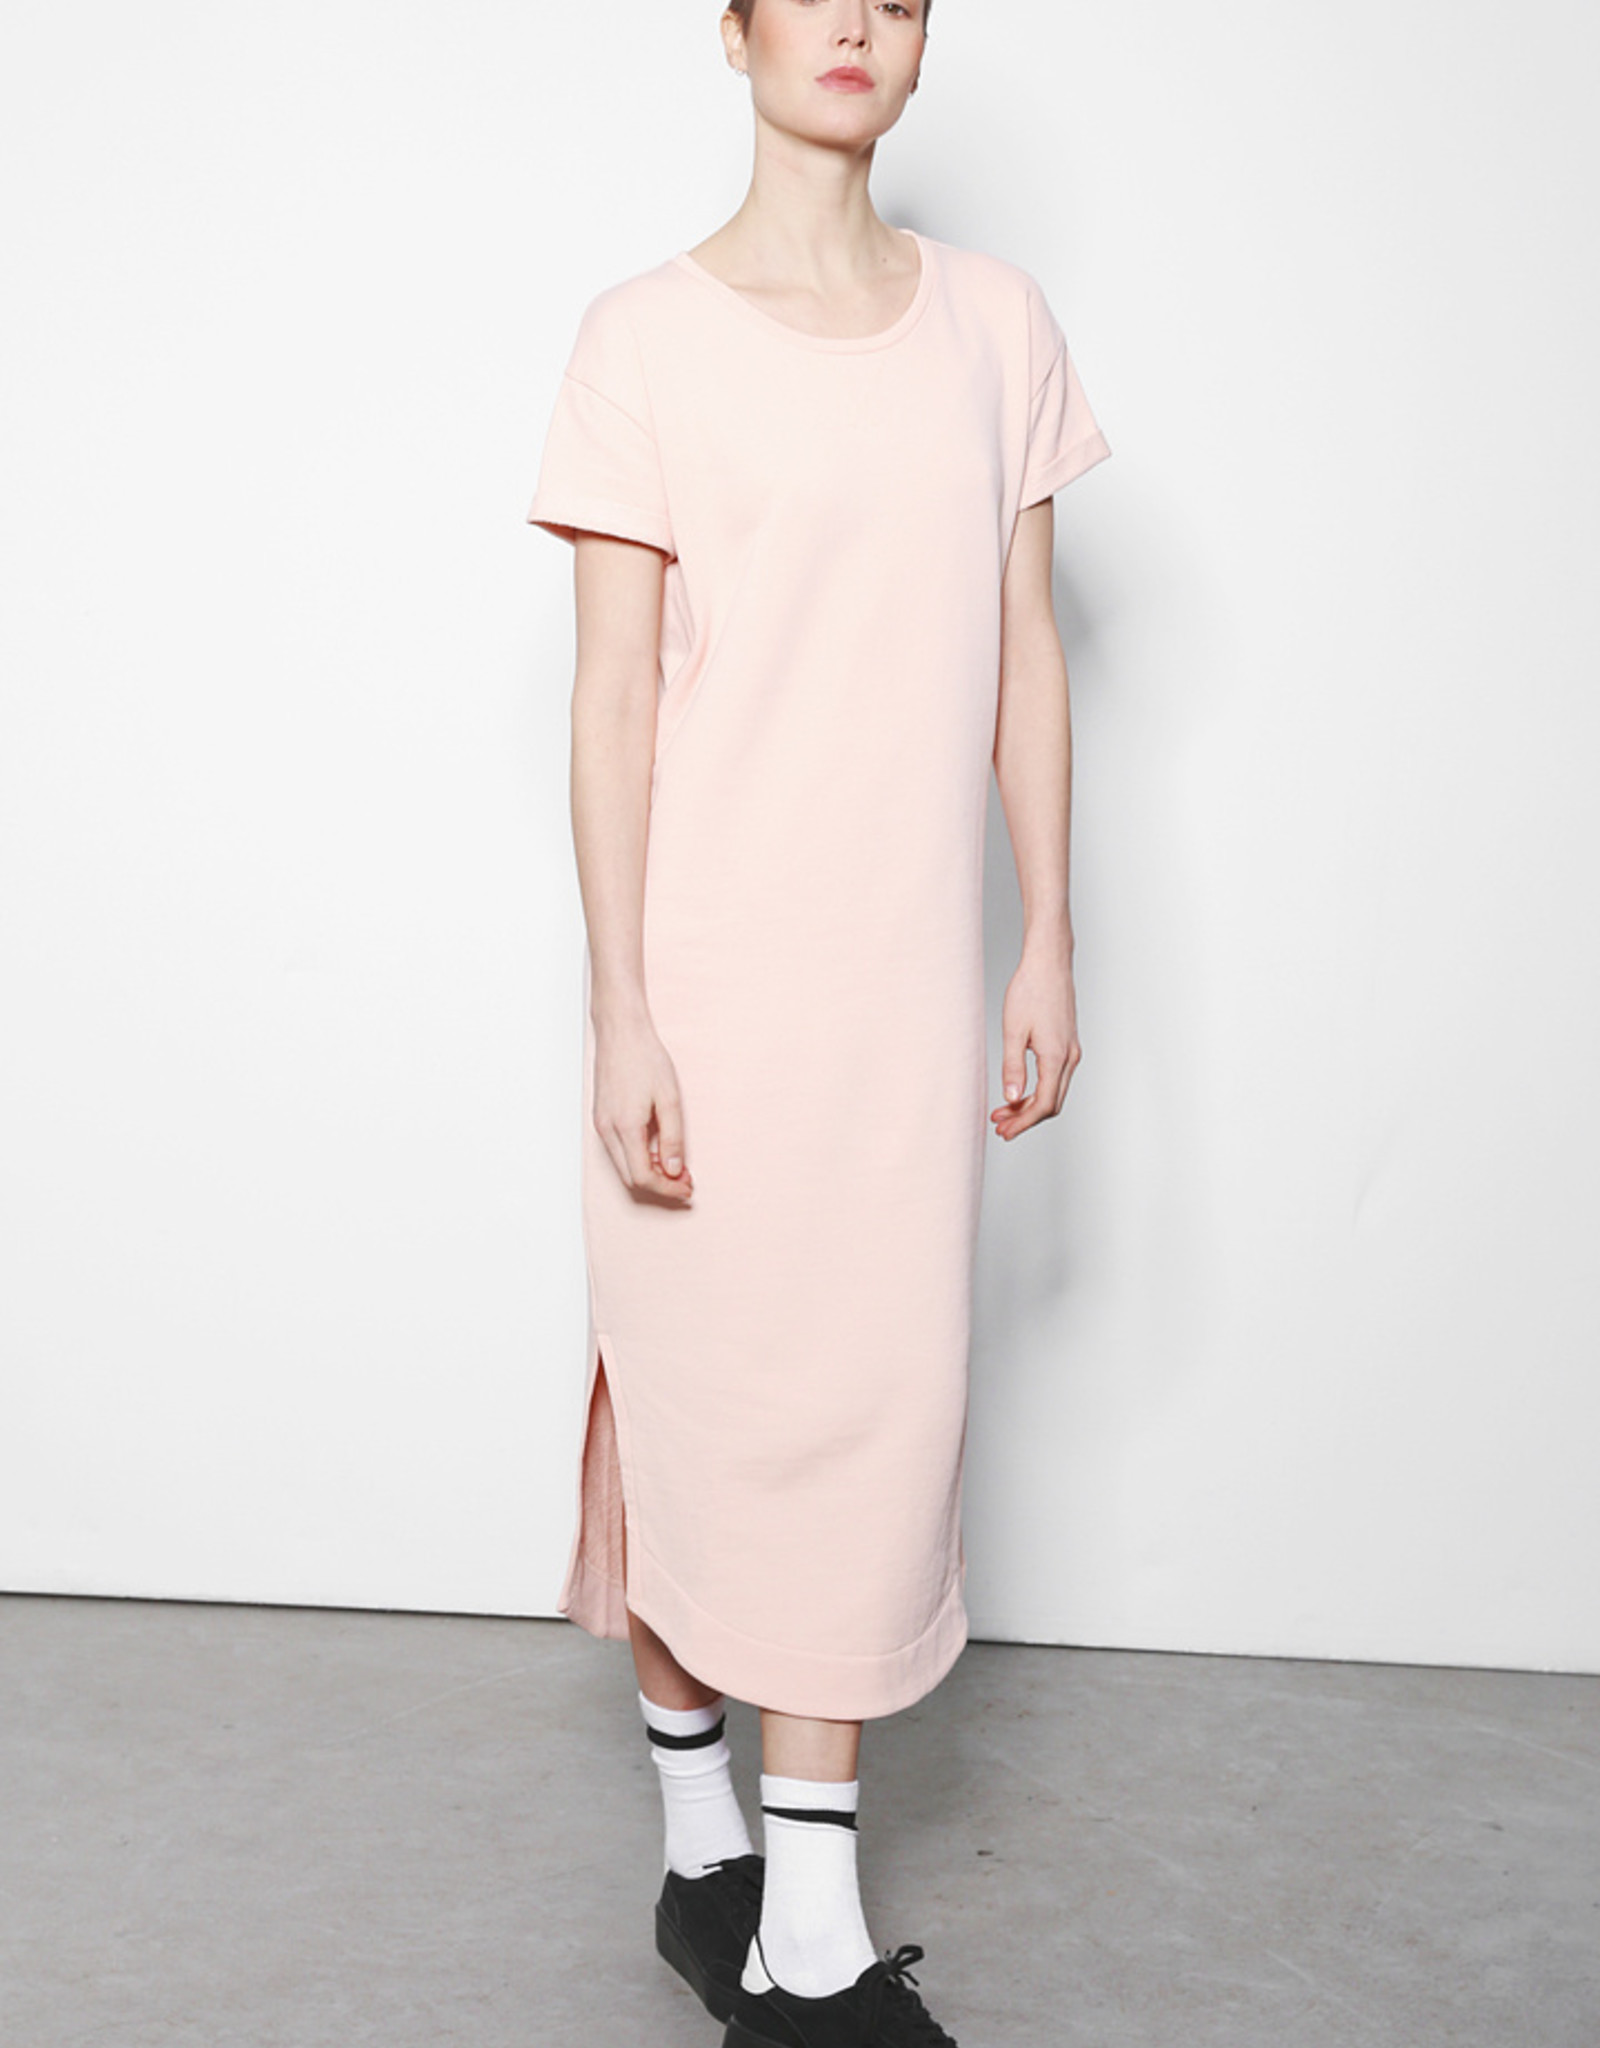 Andie dress pale blush